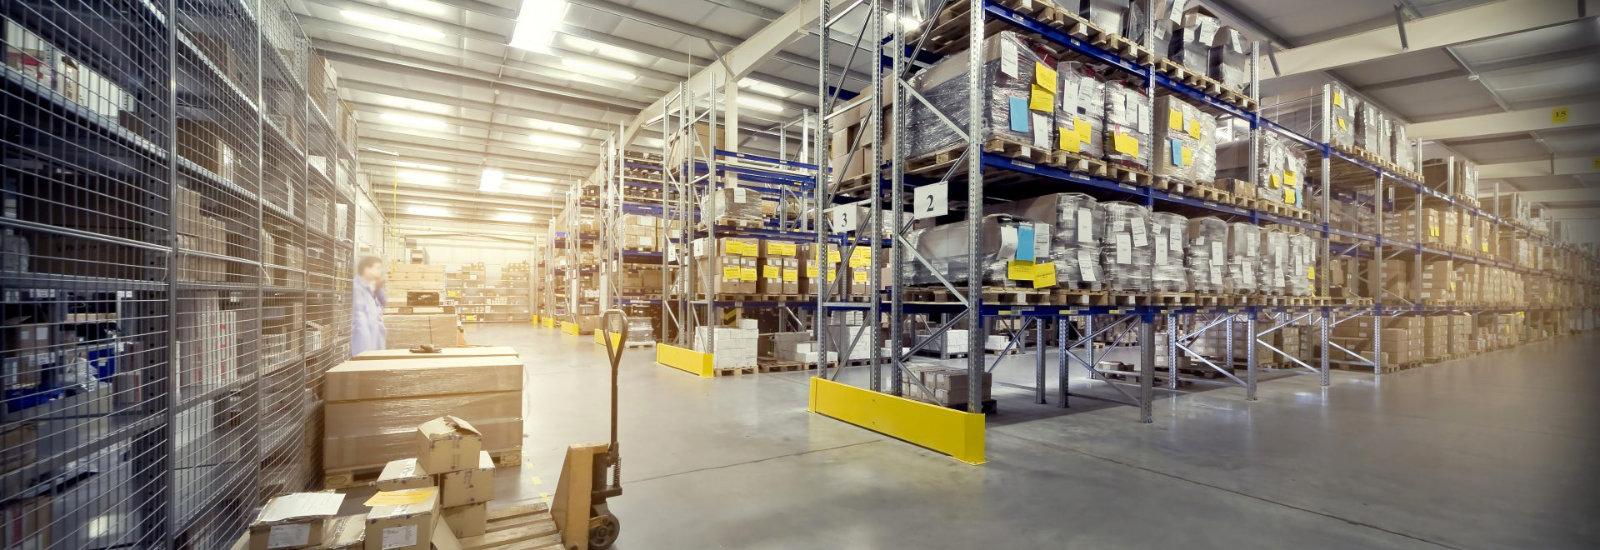 оценка складских помещений